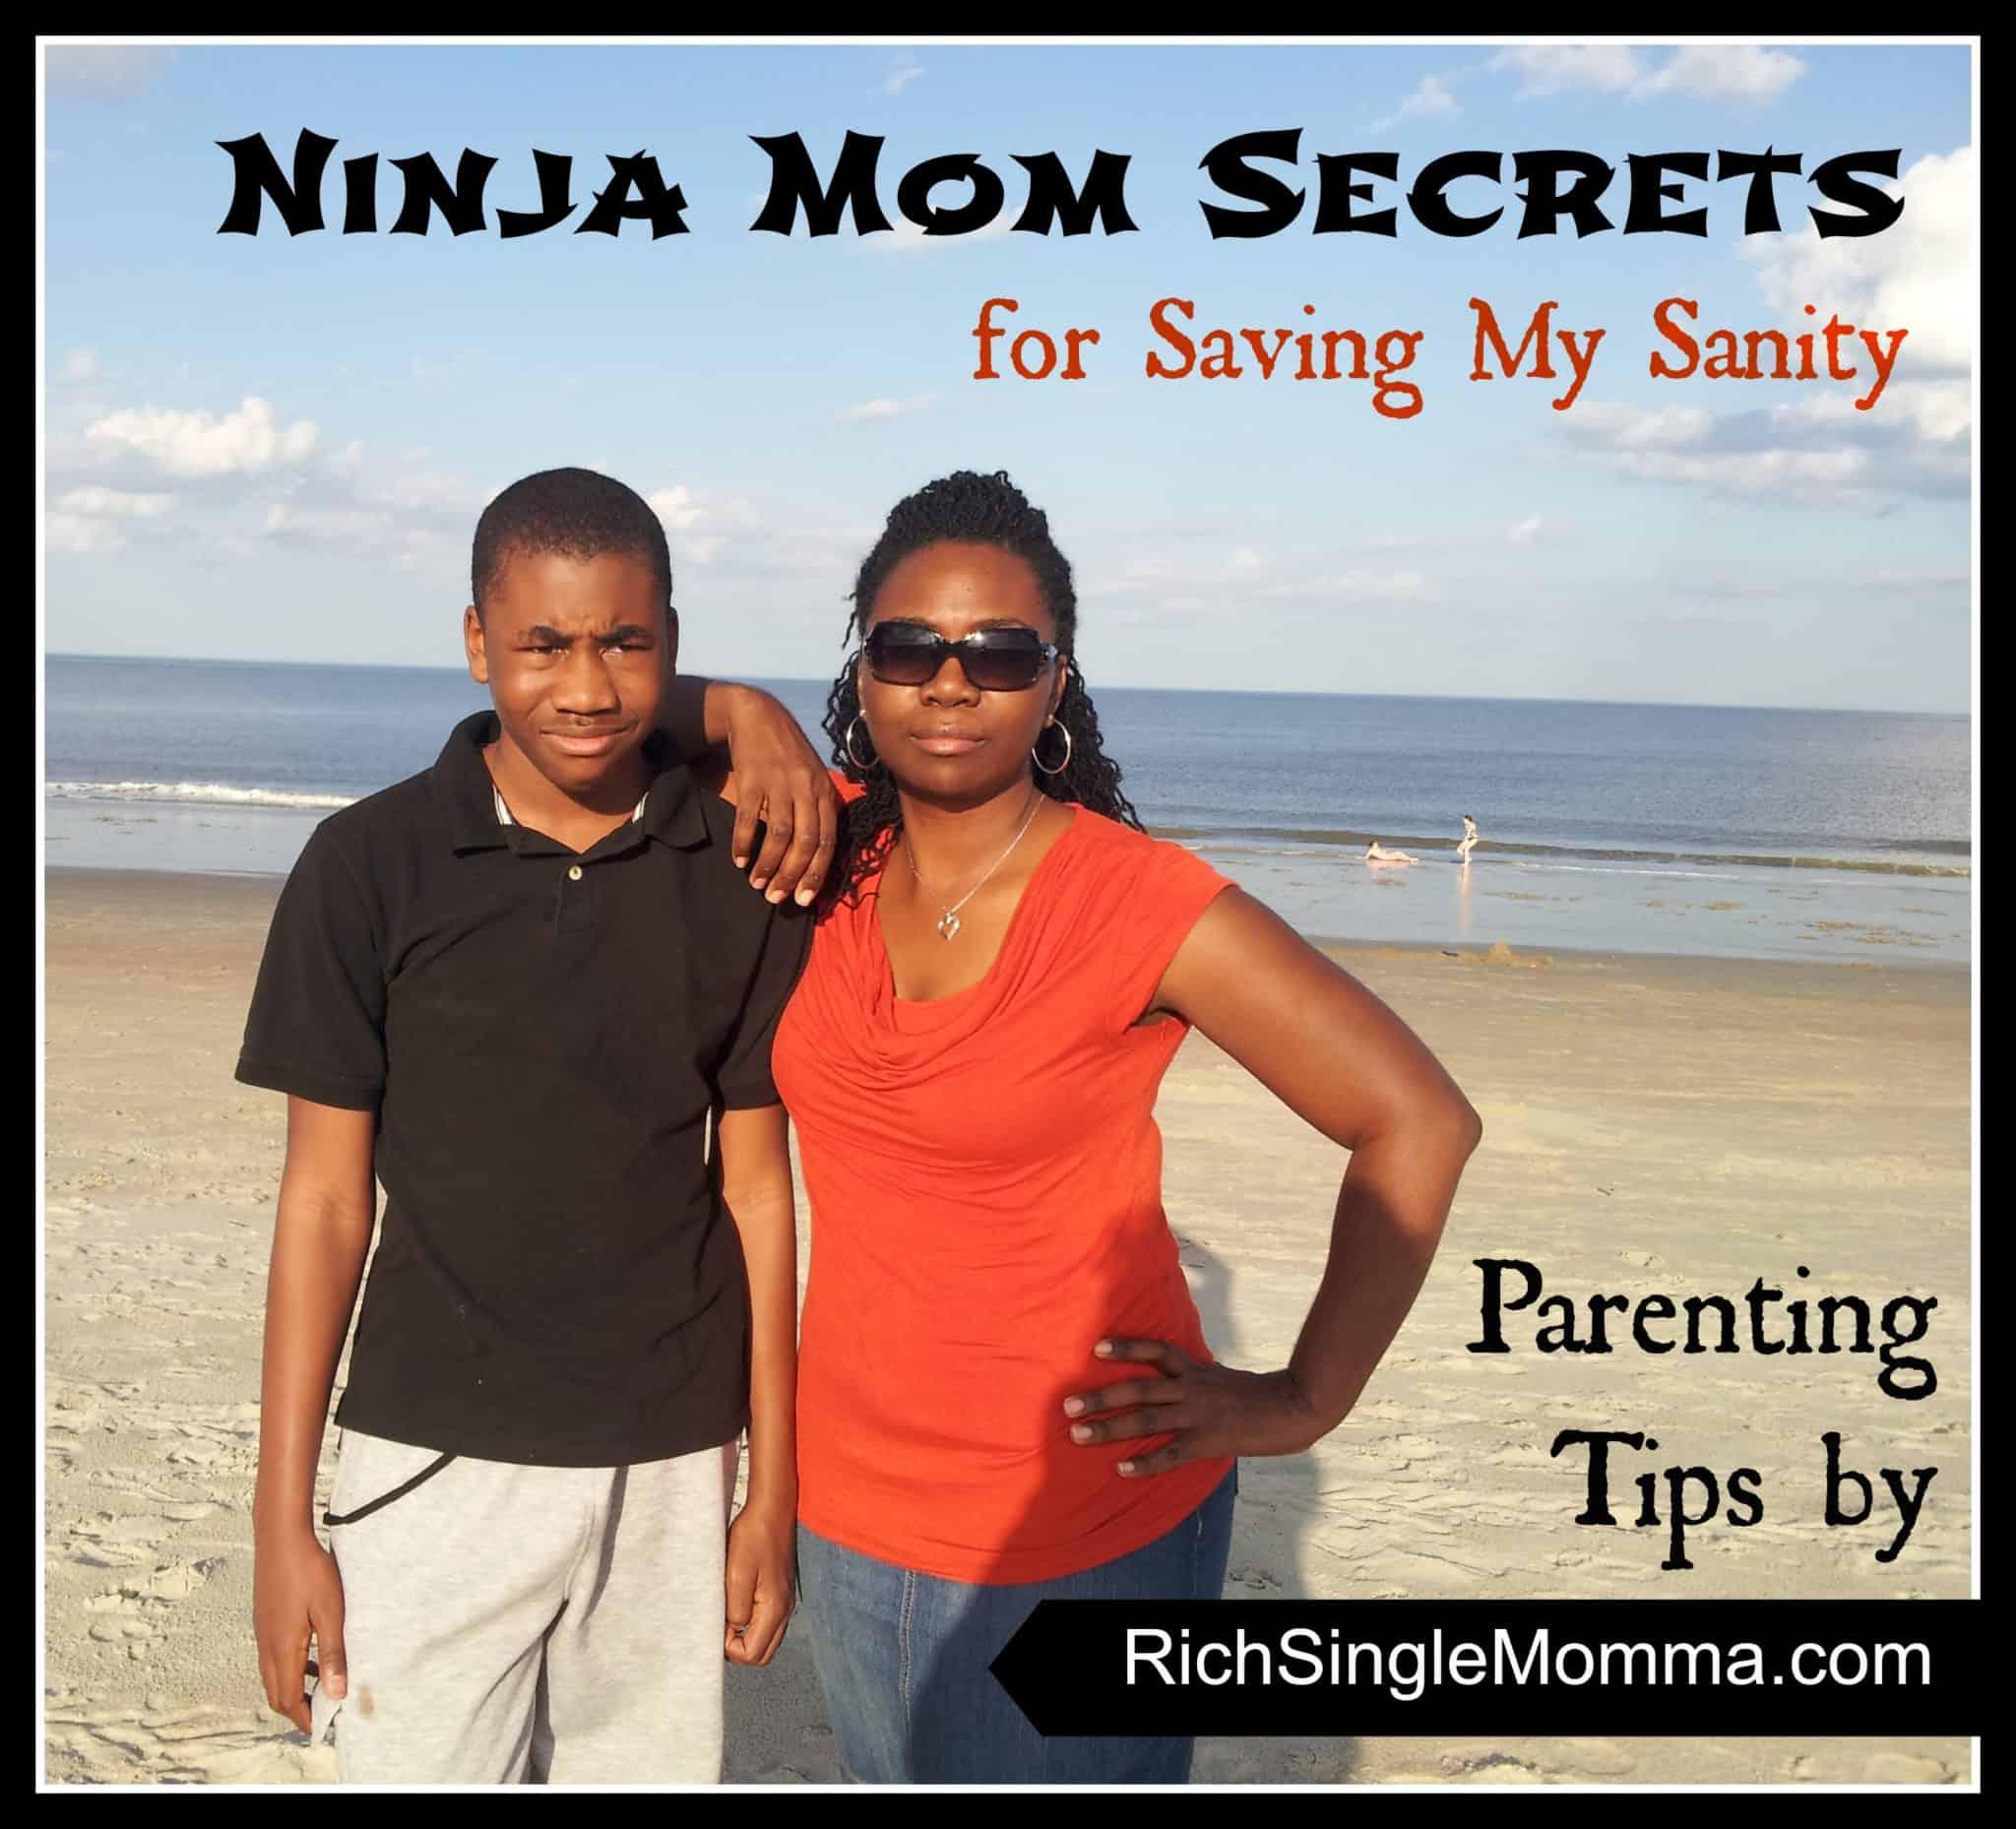 How My Ninja Mom Moves Saves My Sanity